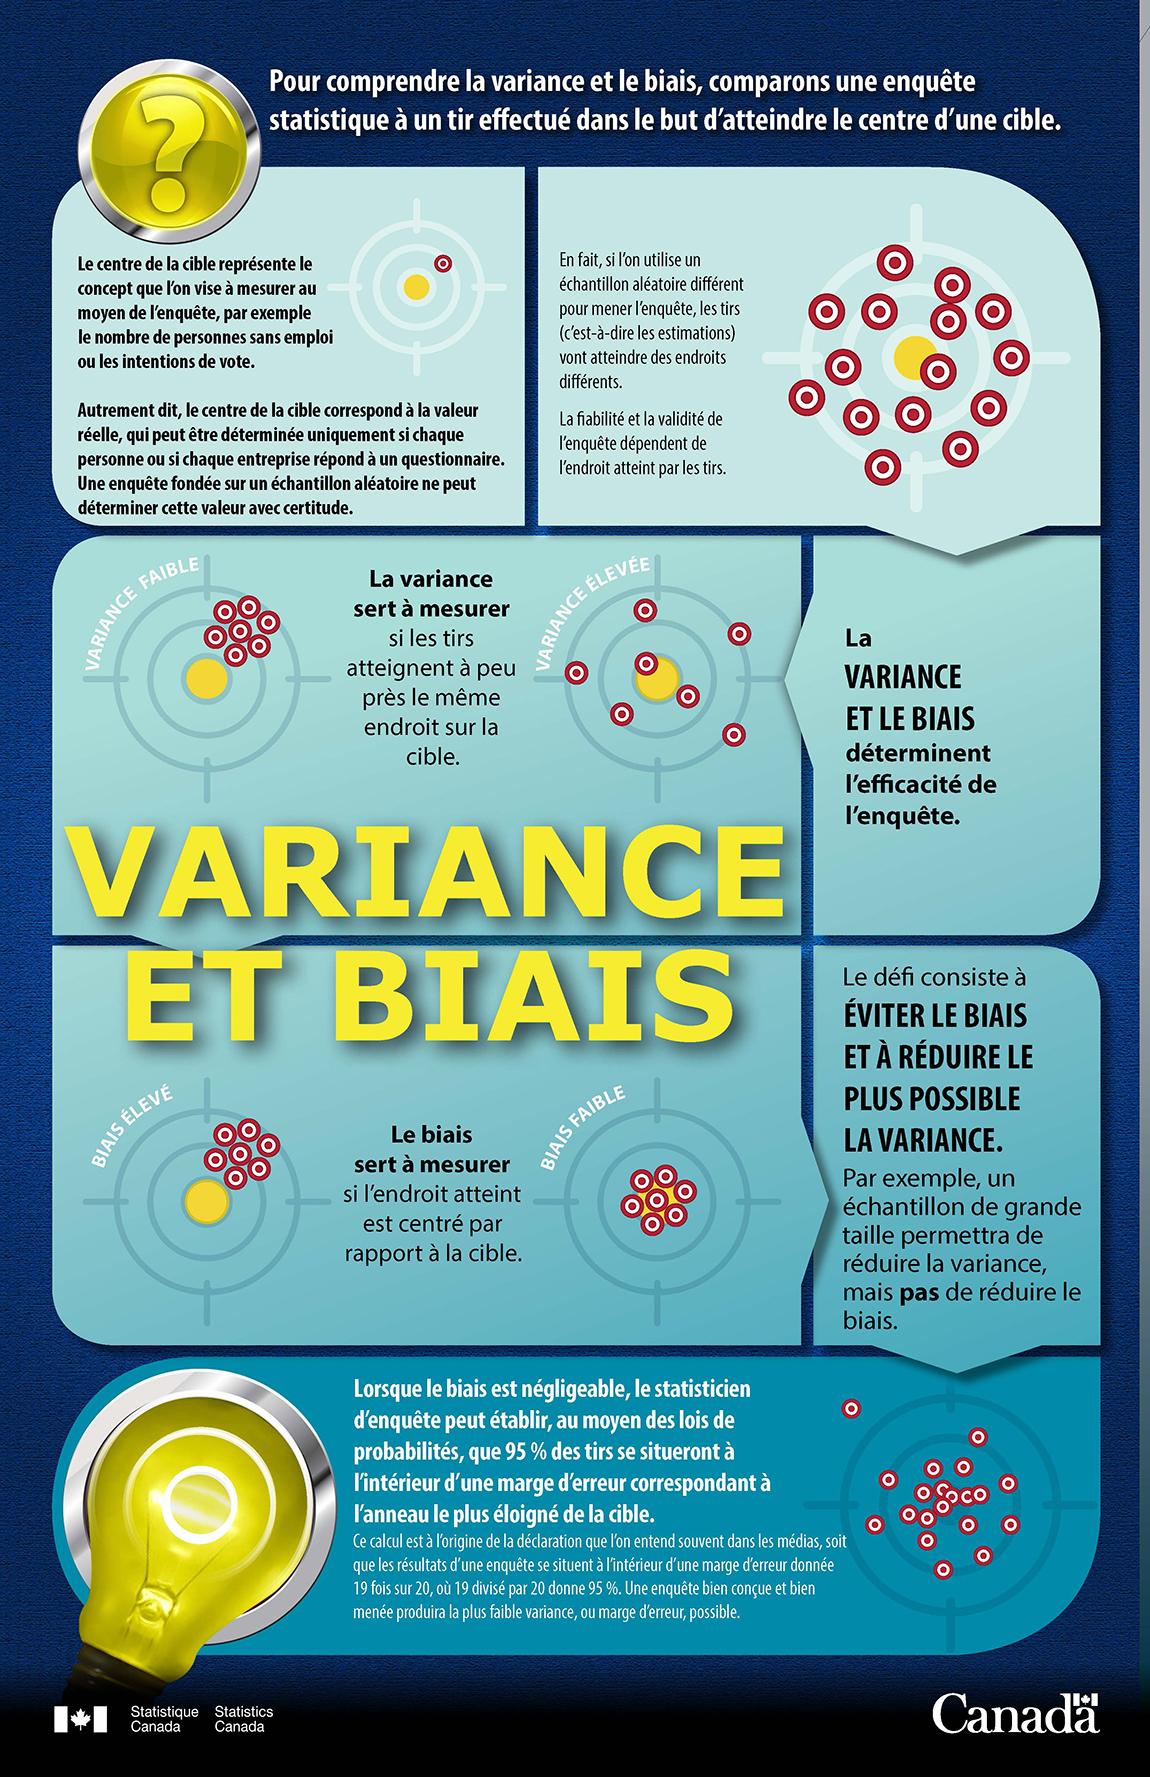 Variance et Biais Infographic